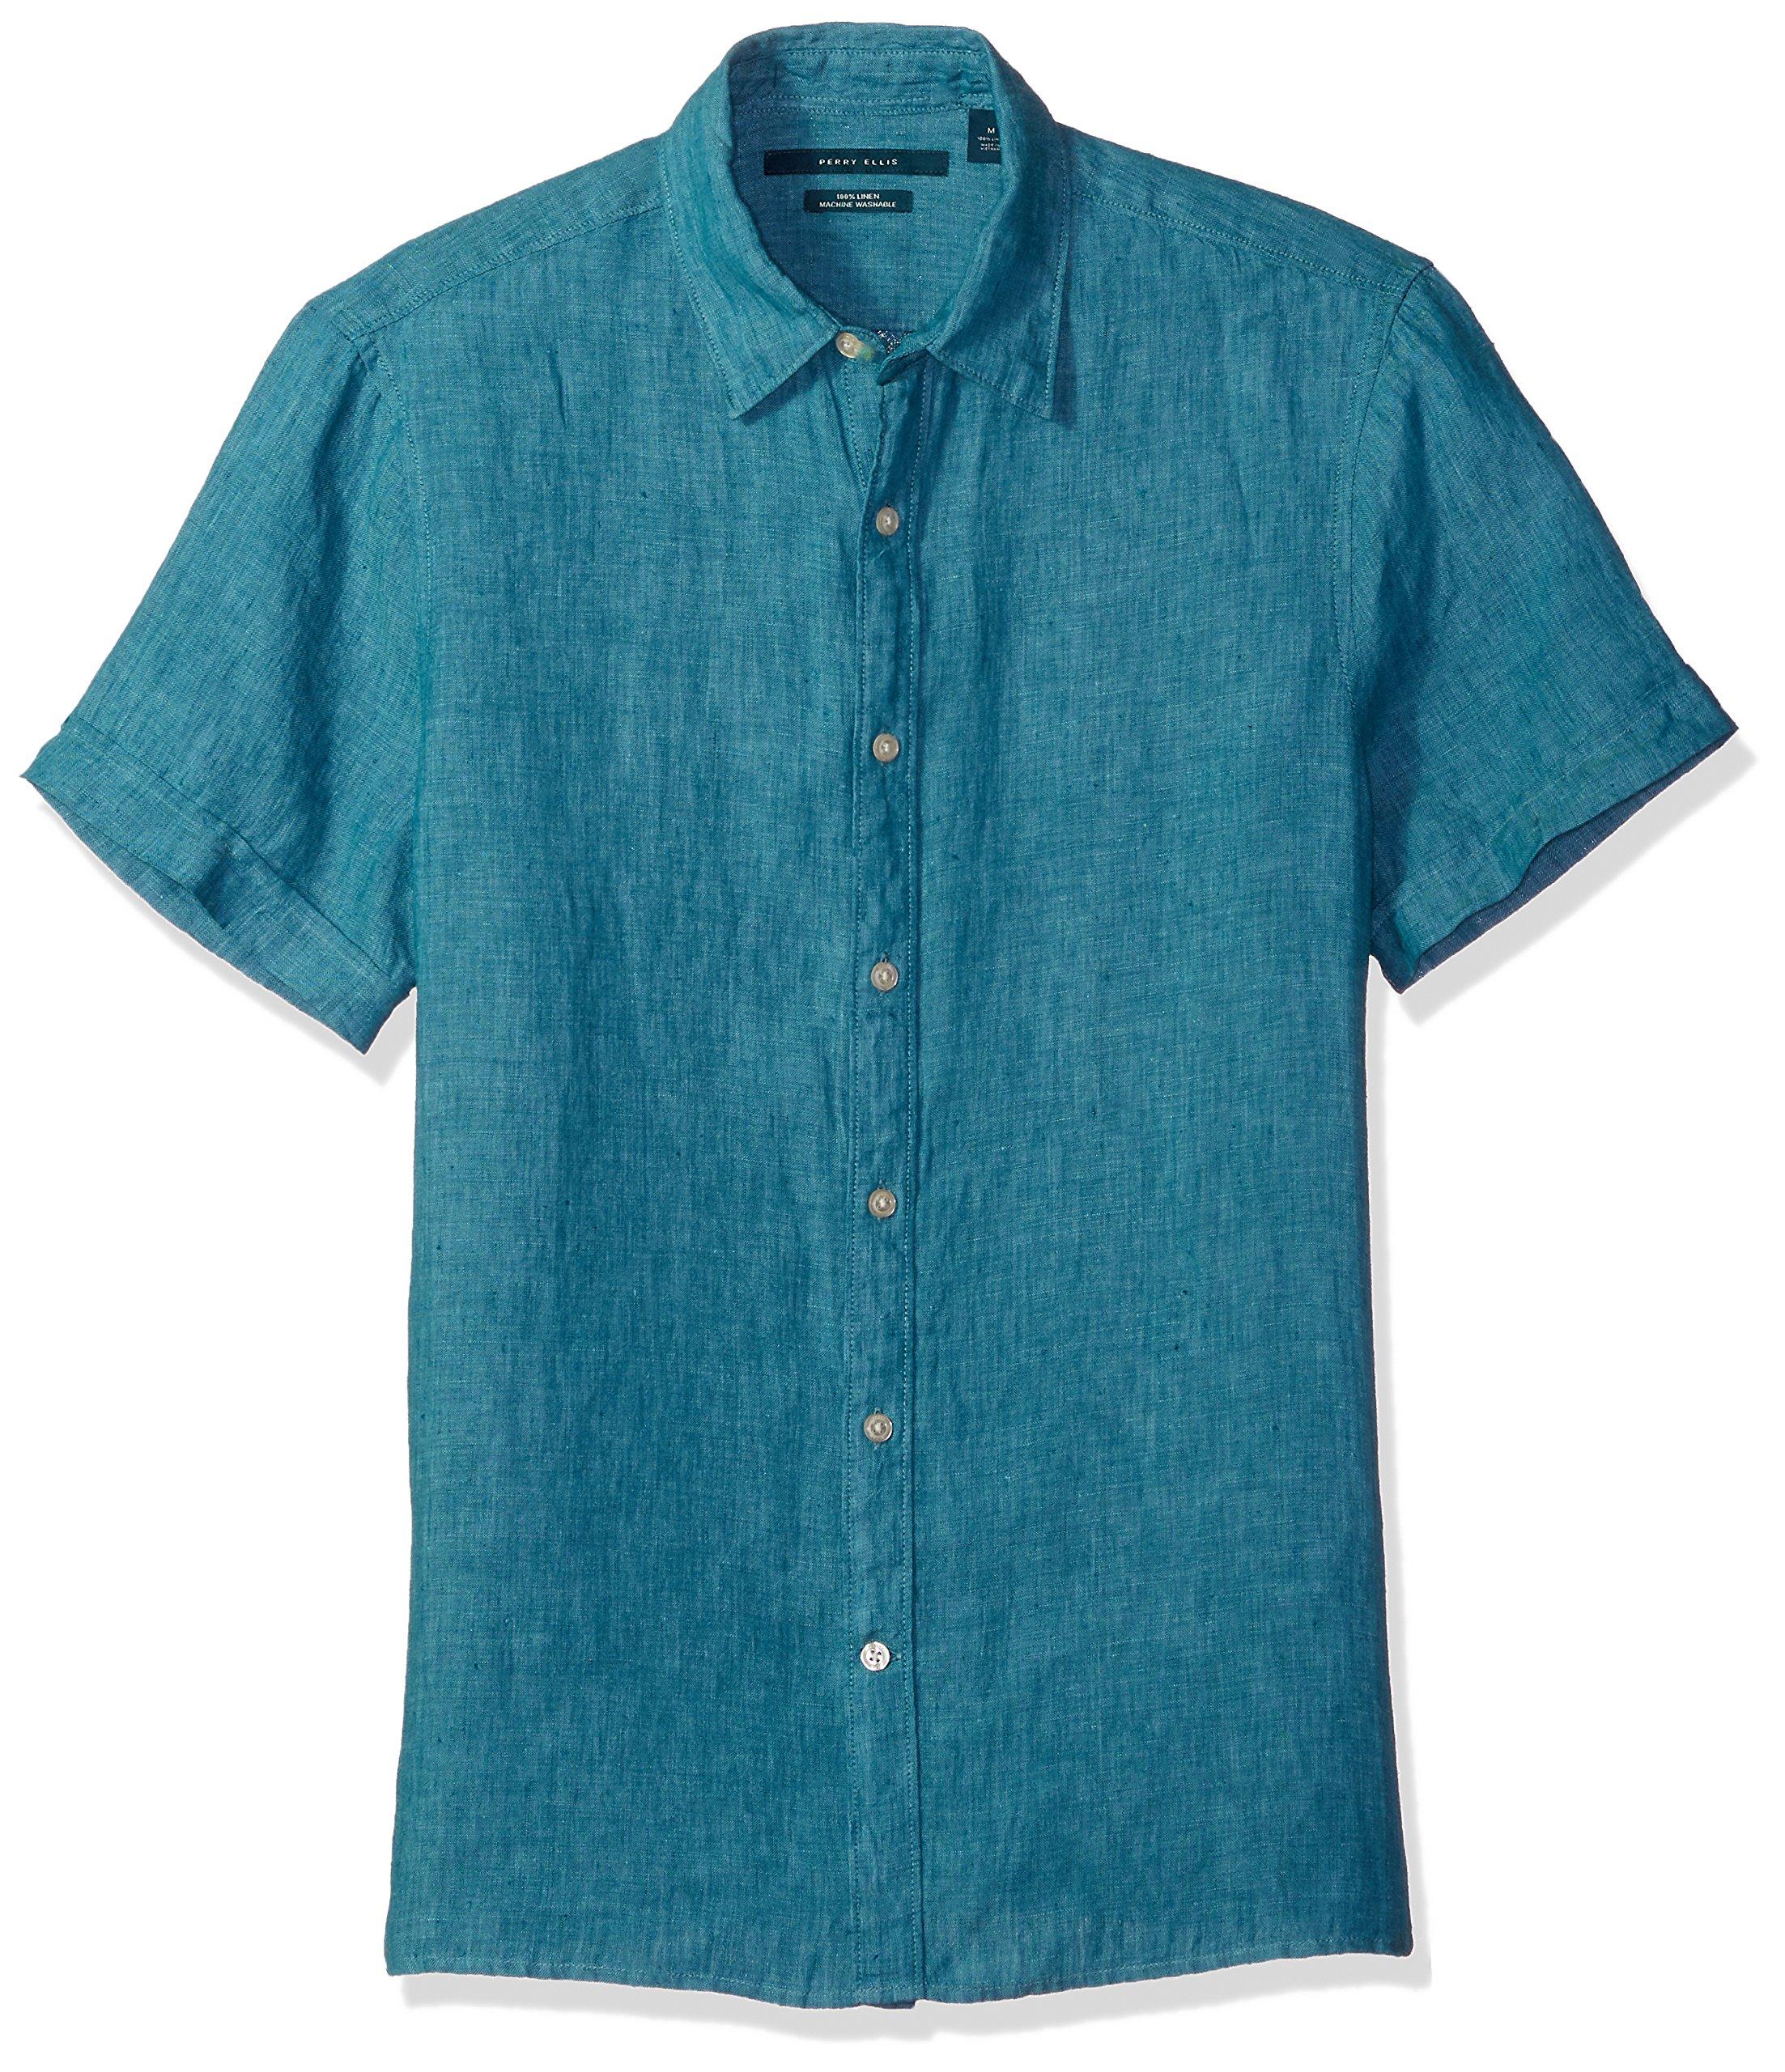 Perry Ellis Men's Short Sleeve Solid Linen Shirt, Blue Coral-4chw7061, X-Large